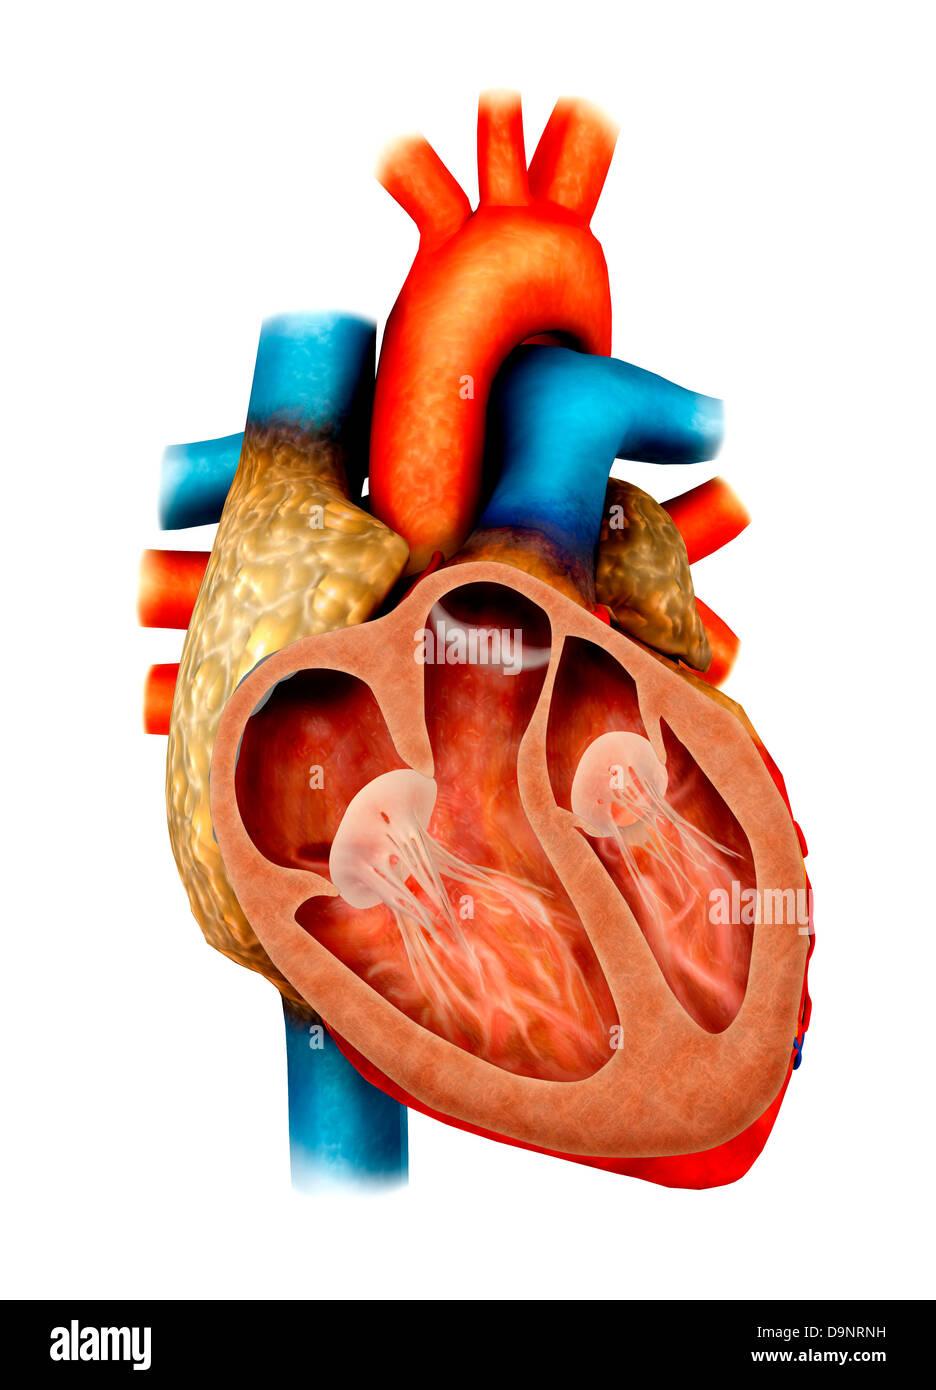 Anatomy of human heart, cross section Stock Photo: 57642637 - Alamy